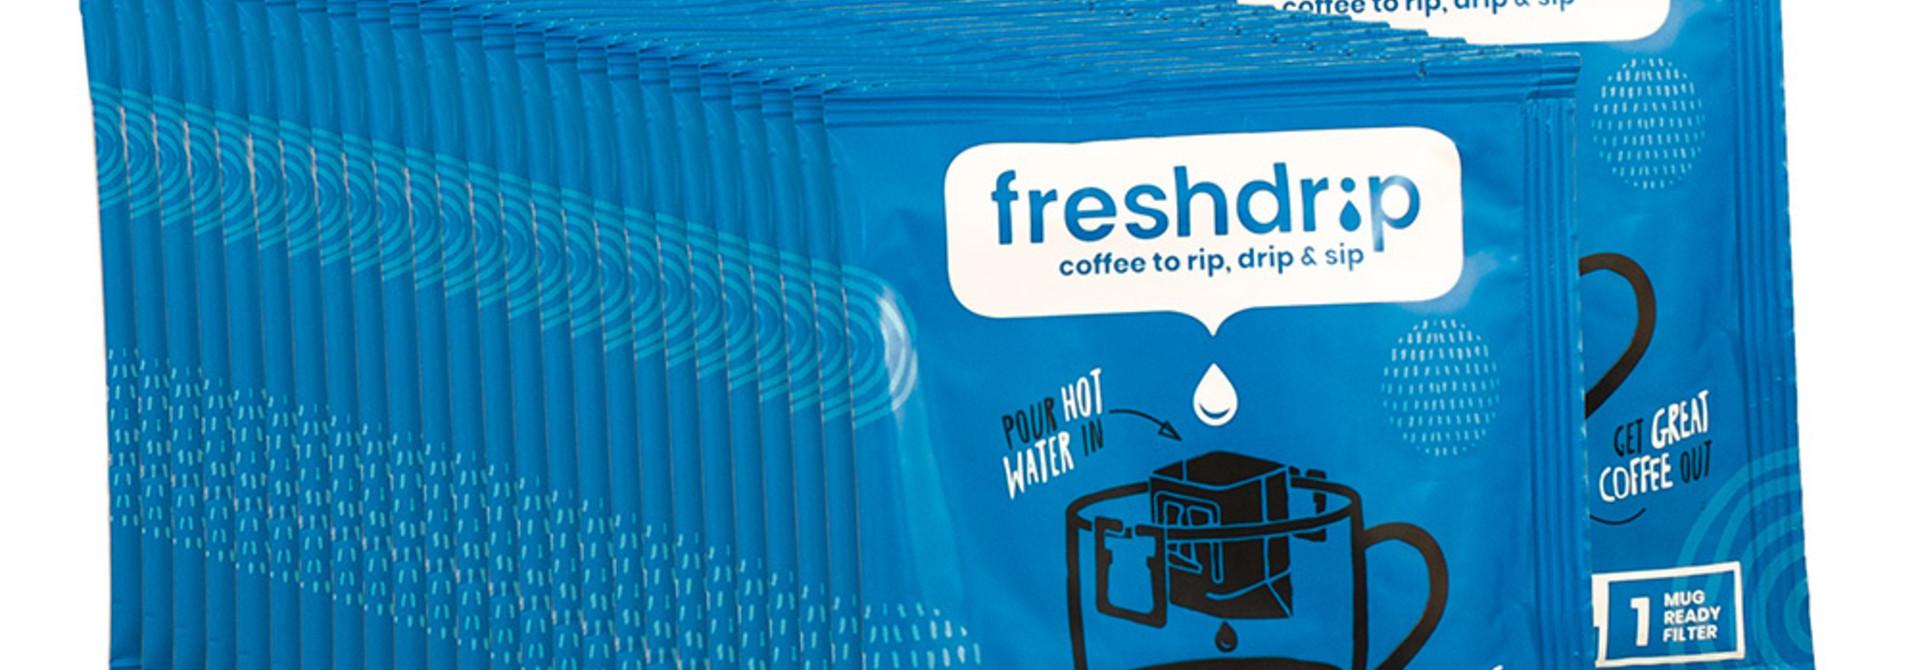 Cafeïnevrij filterkoffie | Ethiopië | 100 Freshdrip super voordeelpak